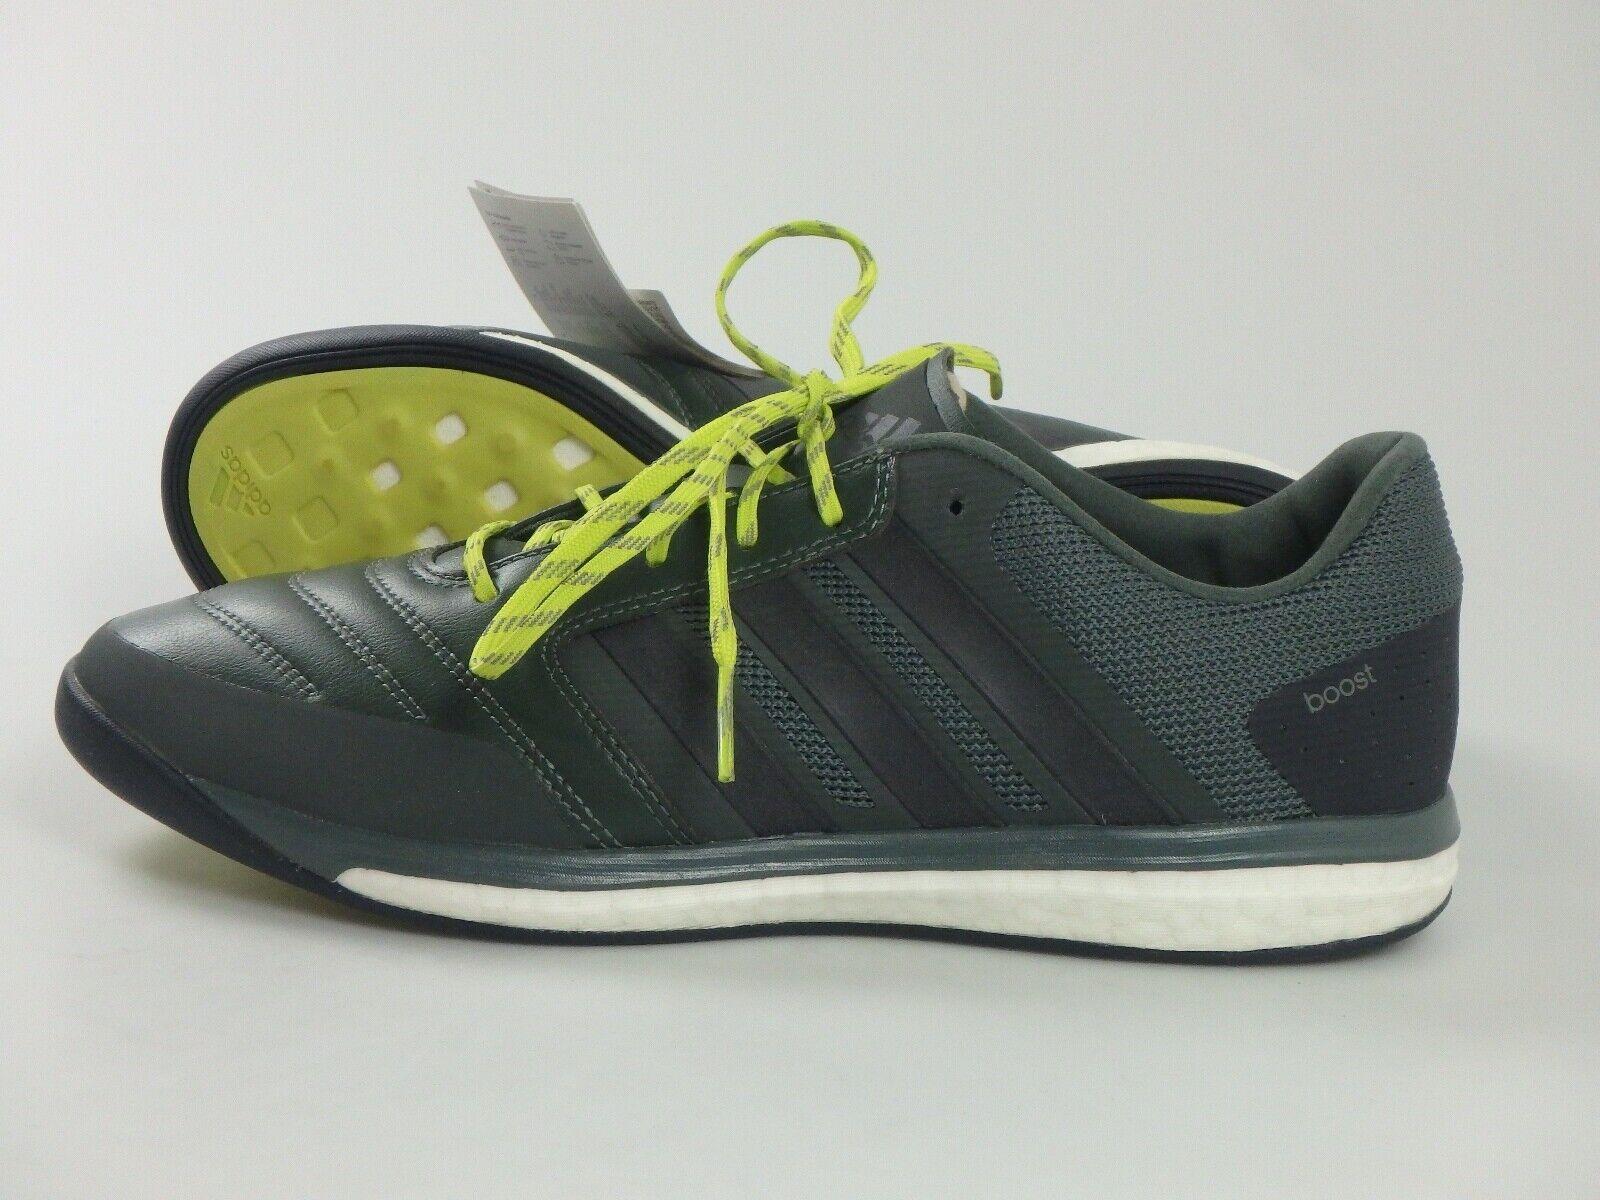 Adidas  30191 freefootball Boost zapatos halle indoor fútbol señores verde oliva 42 2 3